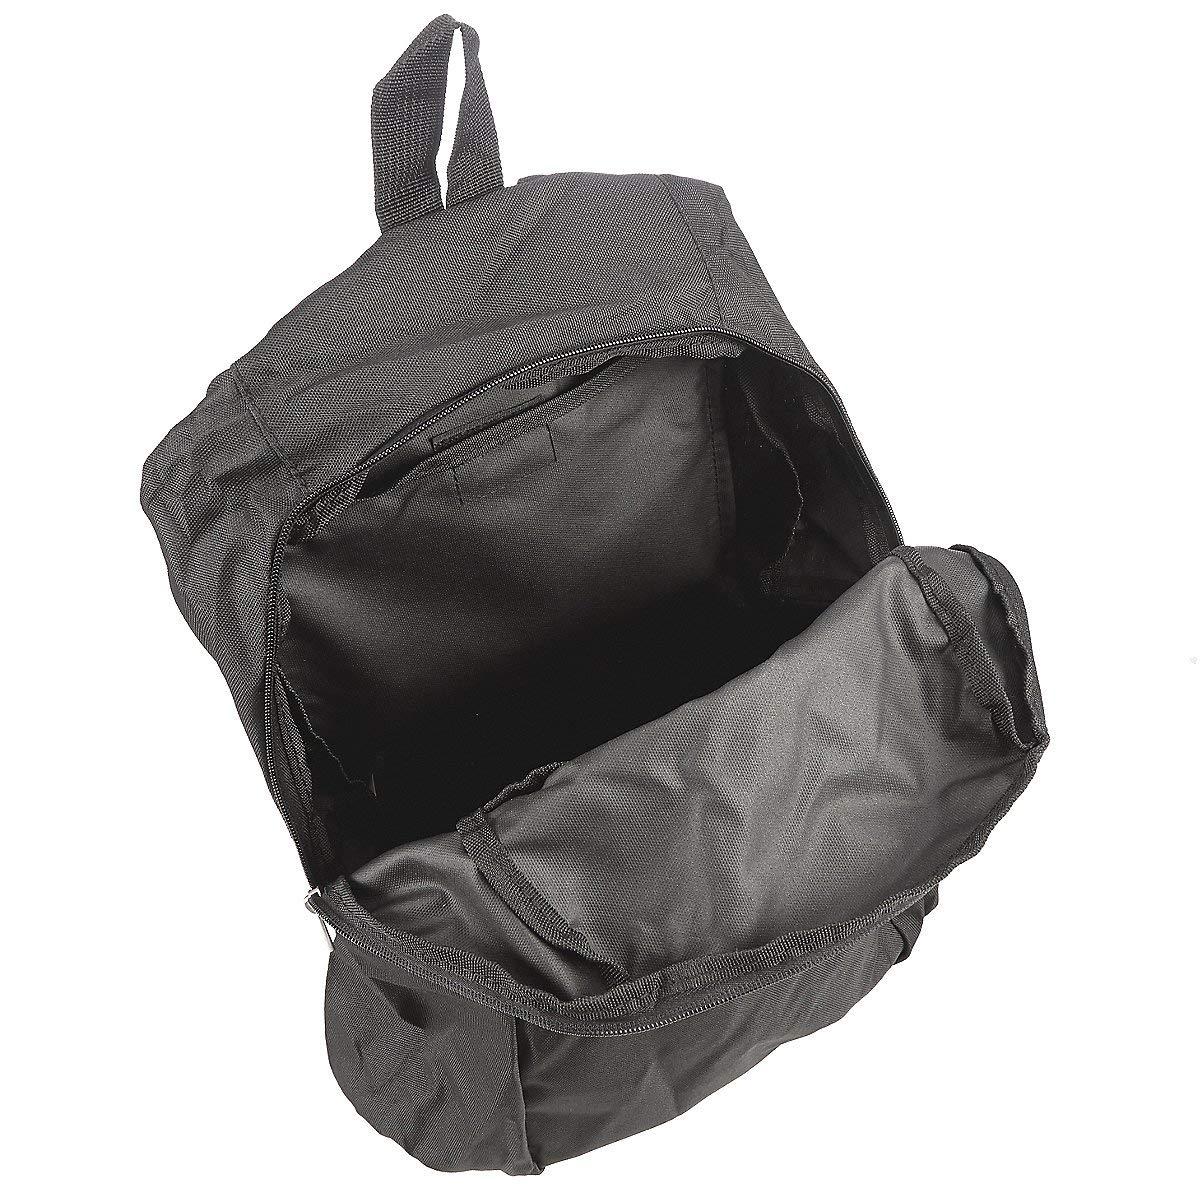 2b6eb1423e47f Samsonite Travel Accessories Packing Accessoires Faltbarer Rucksack 44 cm  Black  Amazon.de  Koffer